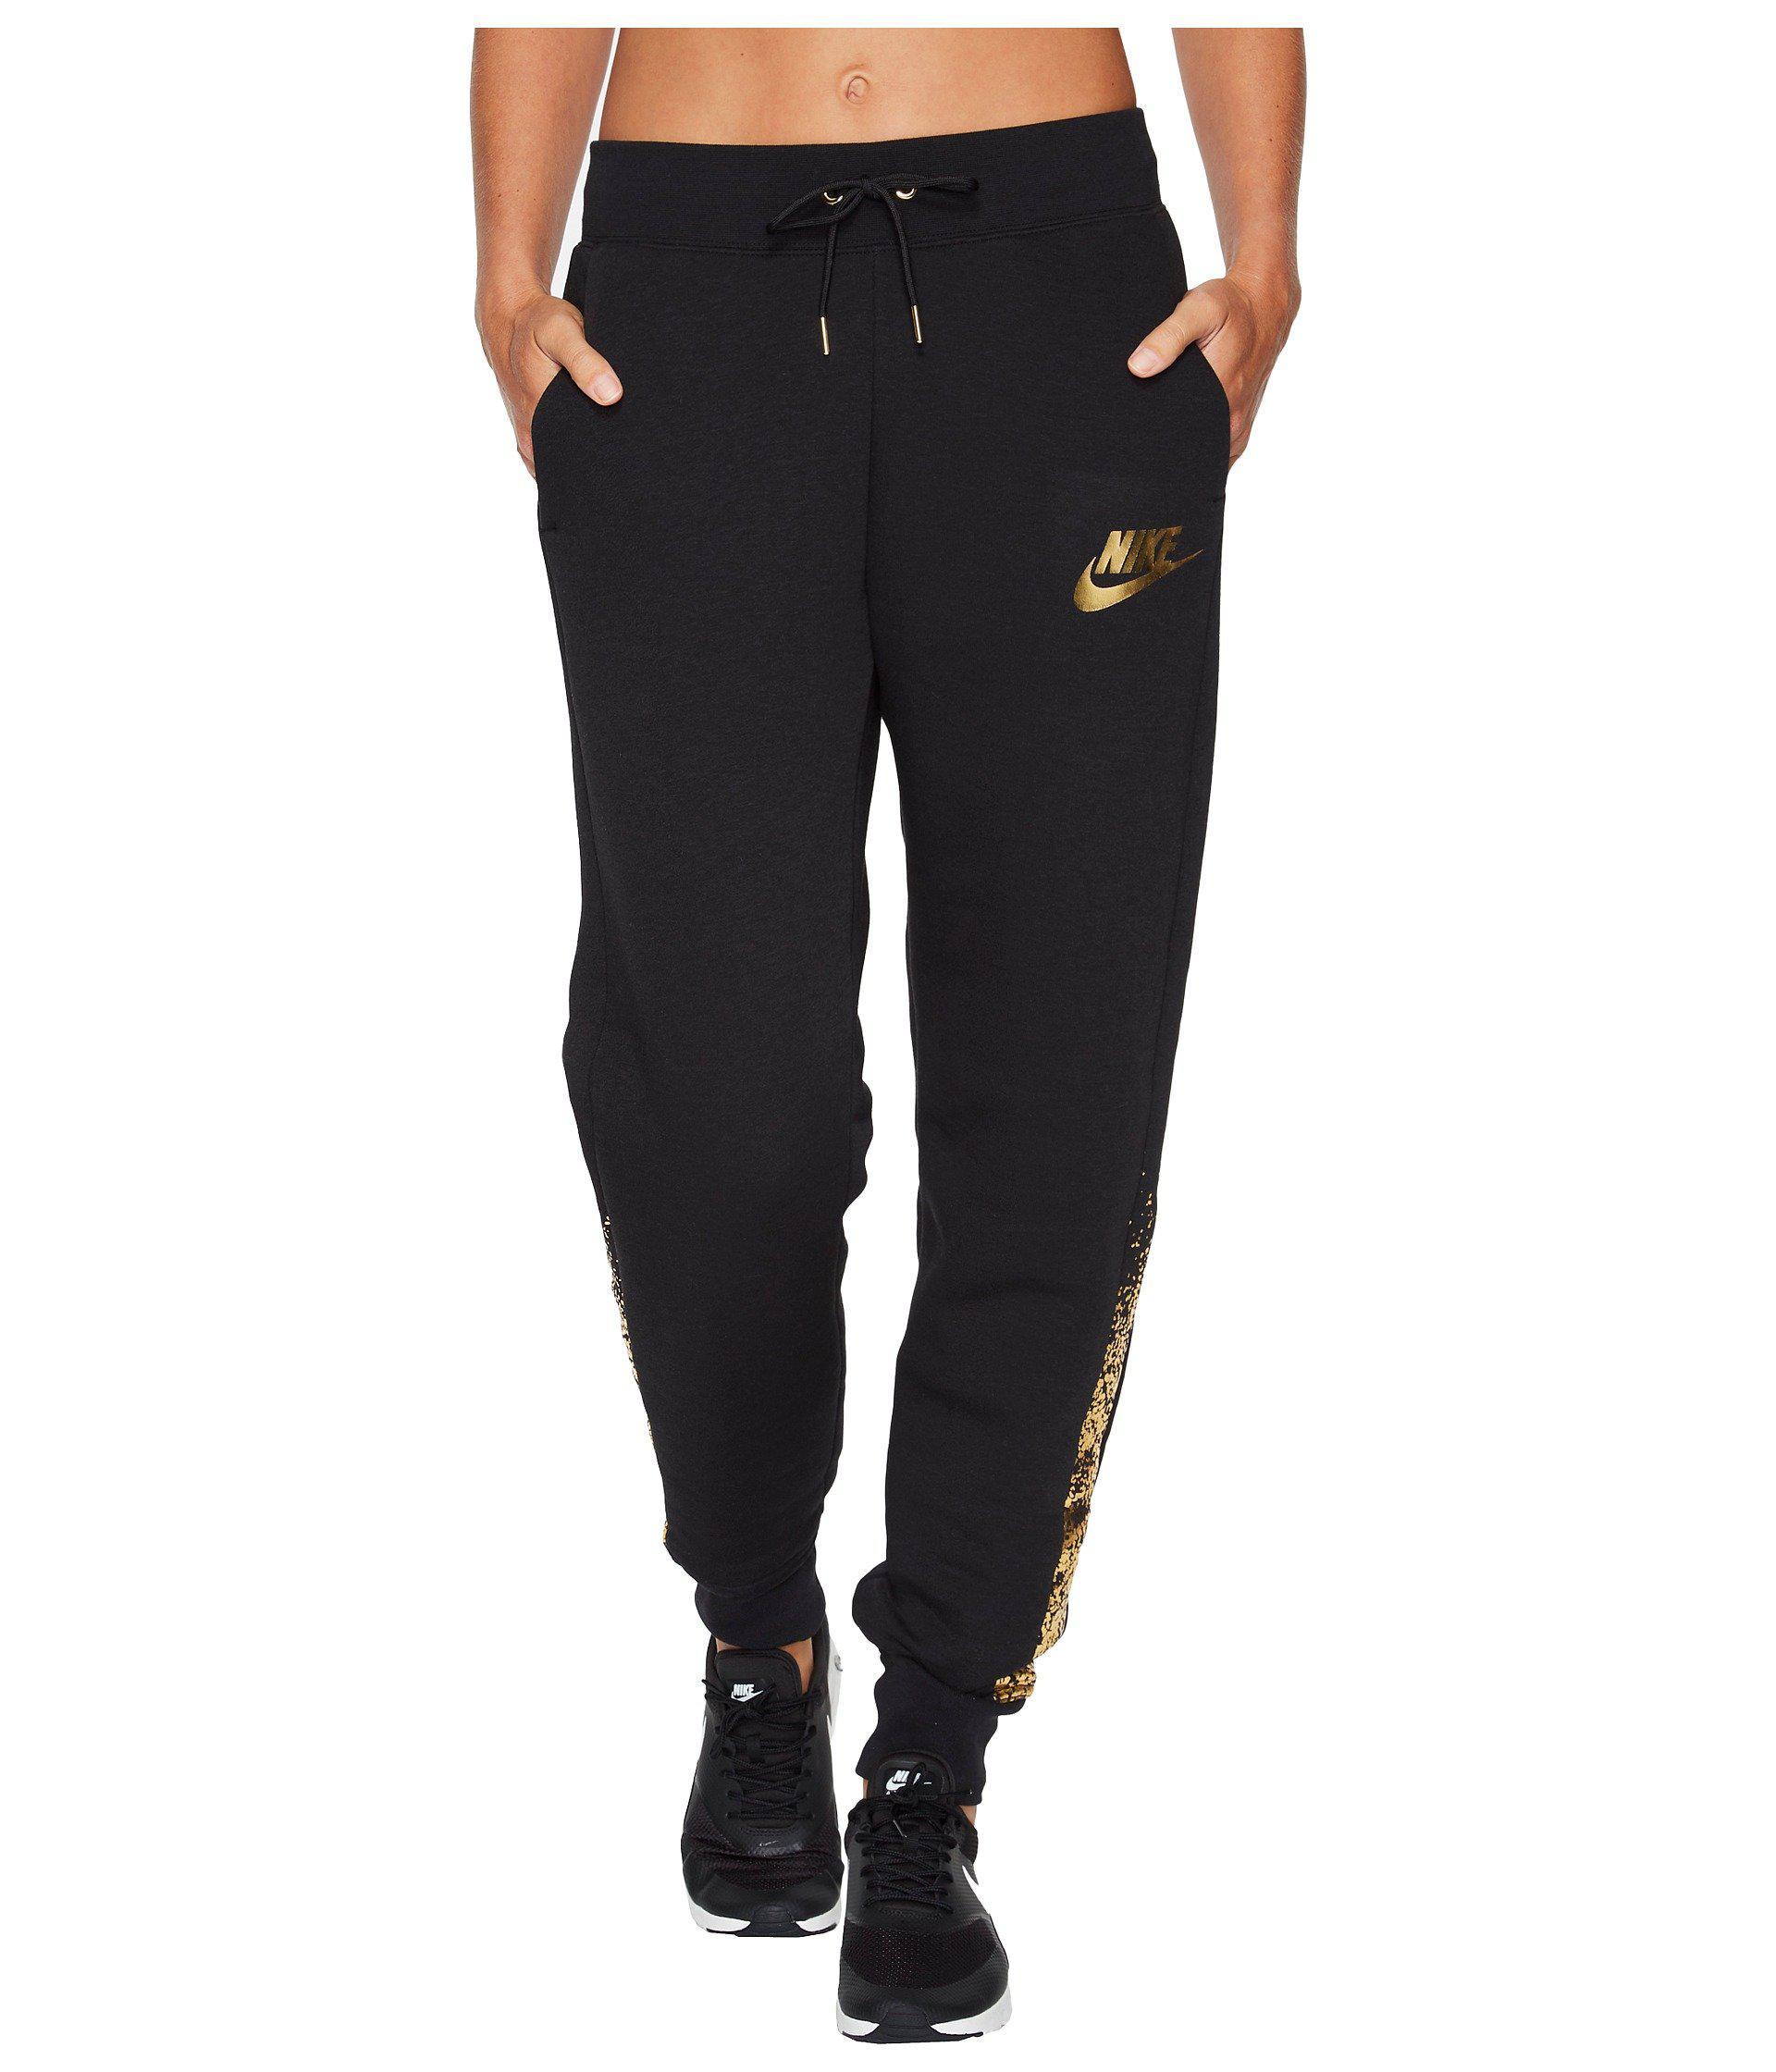 f6d3679cf7dd Lyst - Nike Sportswear Rally Metallic Pant (black black) Women s ...